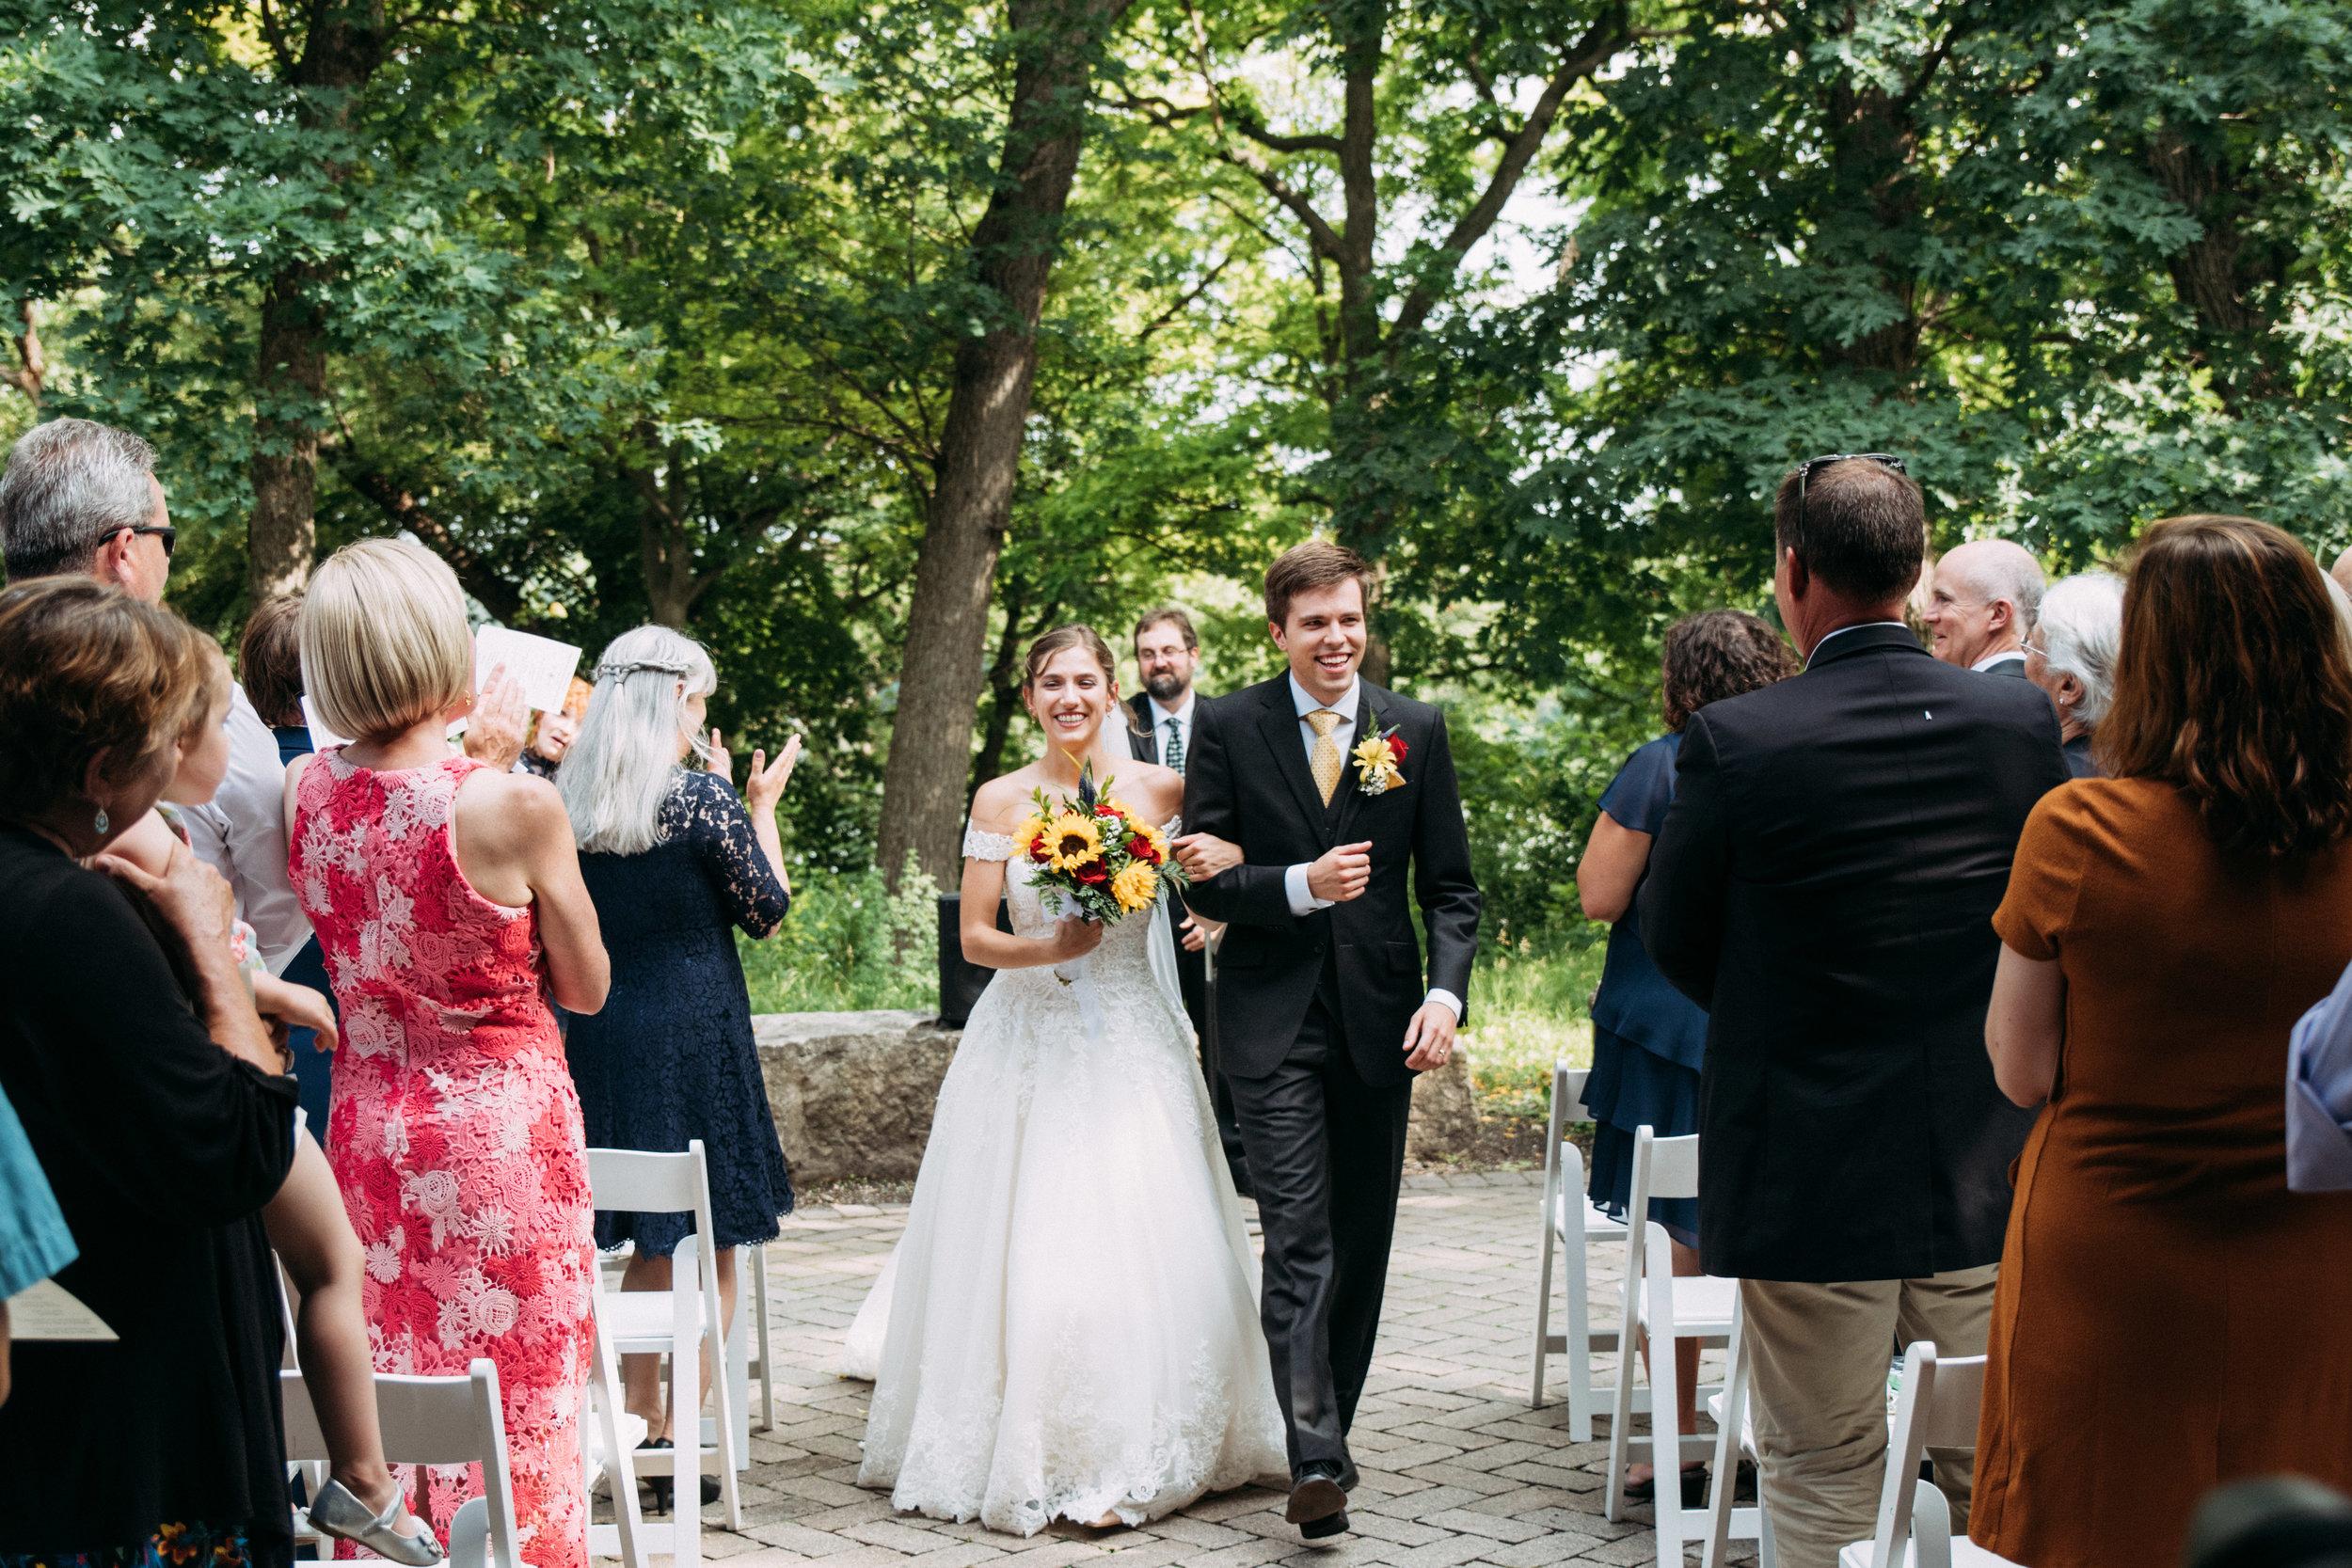 29-Liza_Chris_Minneapolis_Minnesota_Wedding.jpg